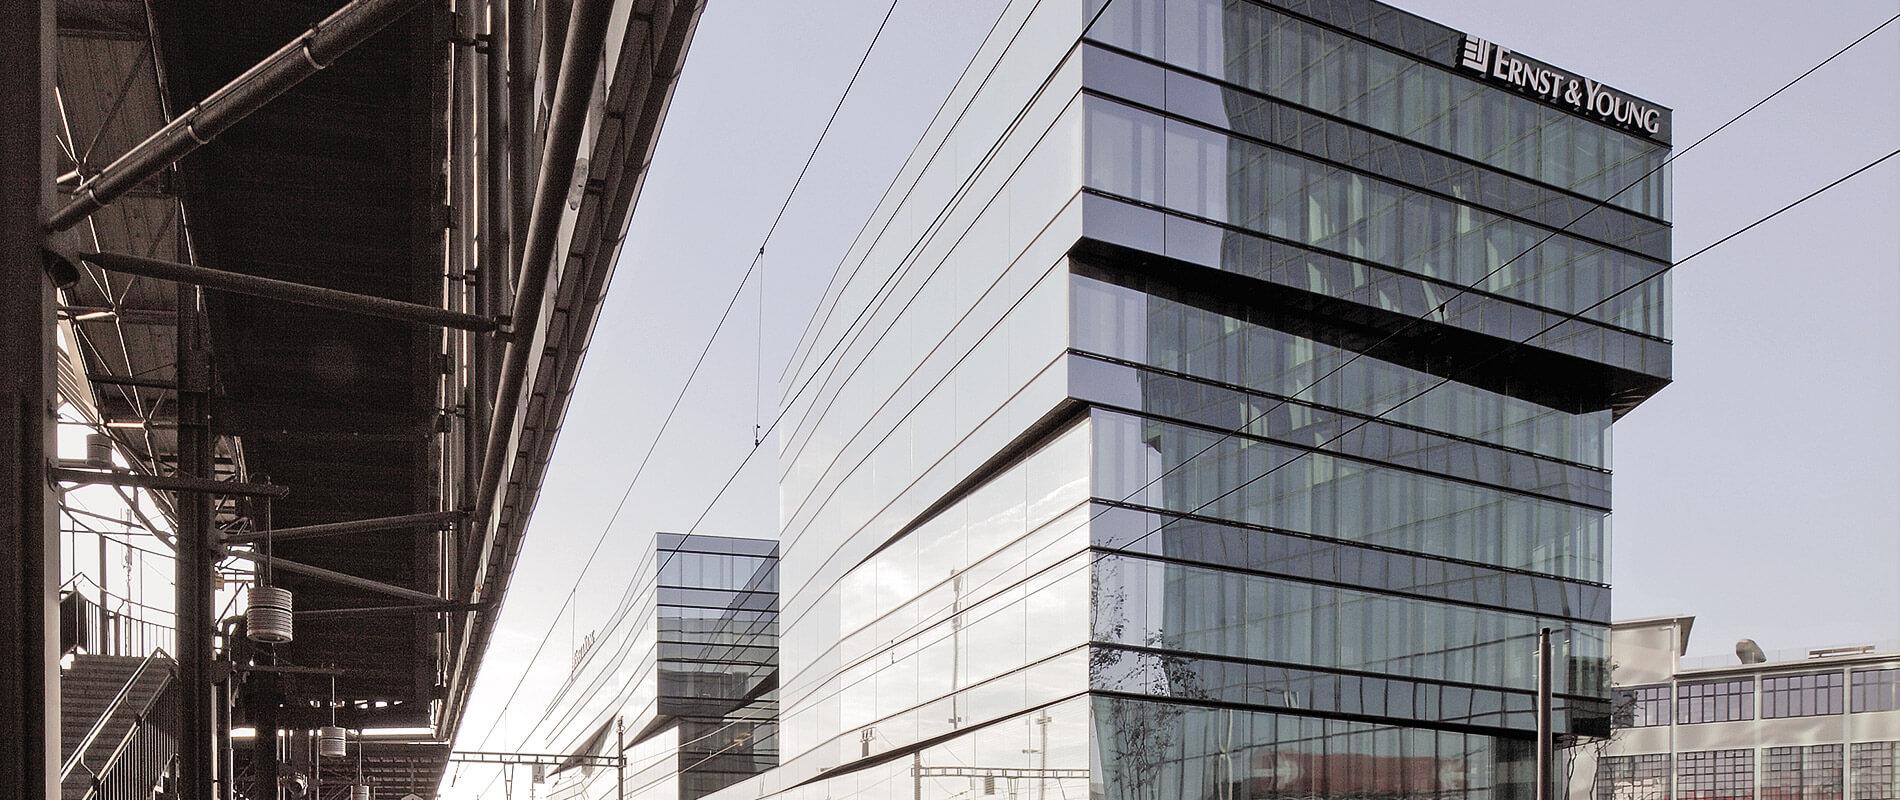 Platform |Zürich | Referenz | Ettinger Partner